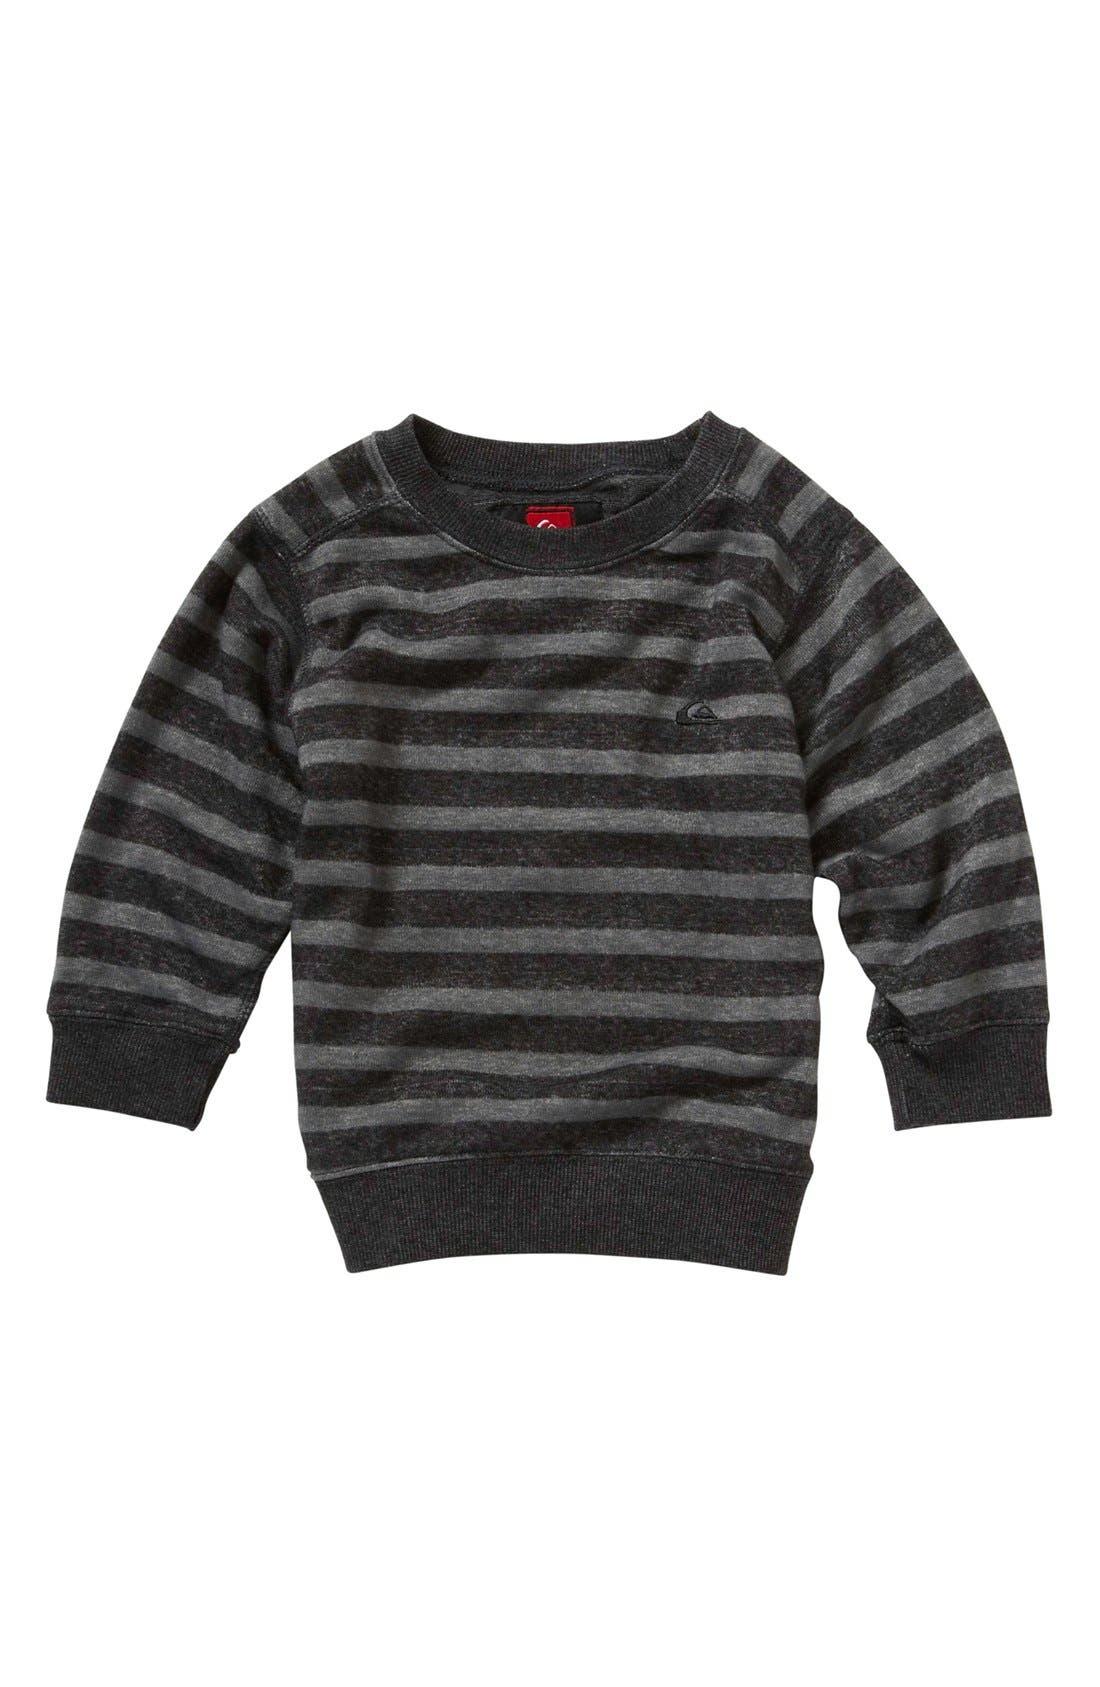 Main Image - Quiksilver 'Spiff Tiff' Sweatshirt (Baby Boys)